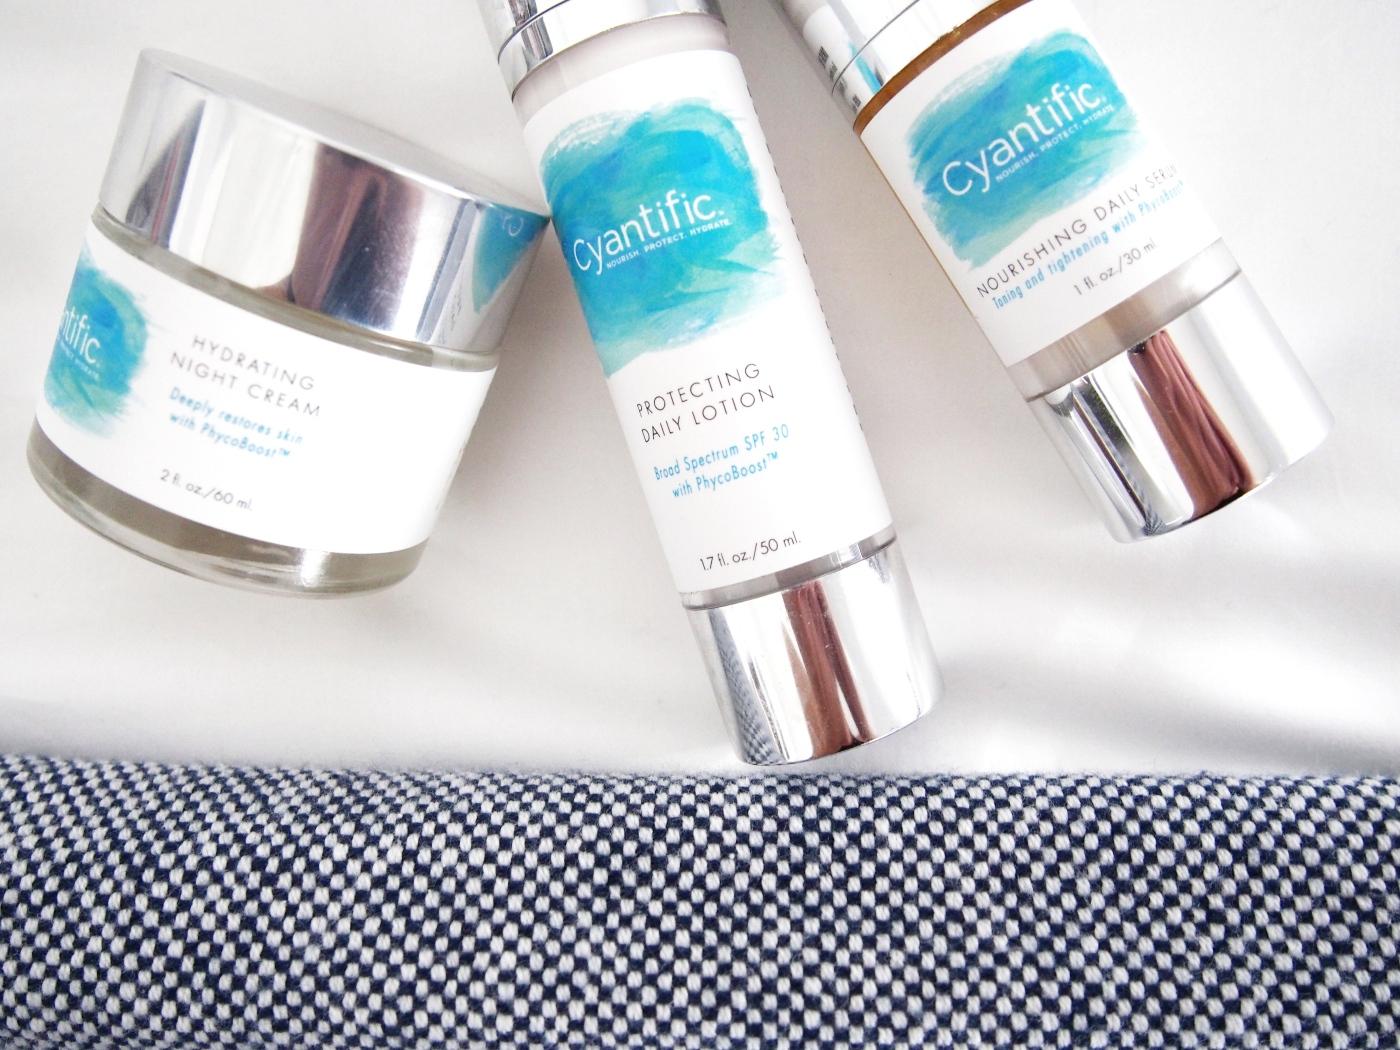 Cyantific Skincare Regimen